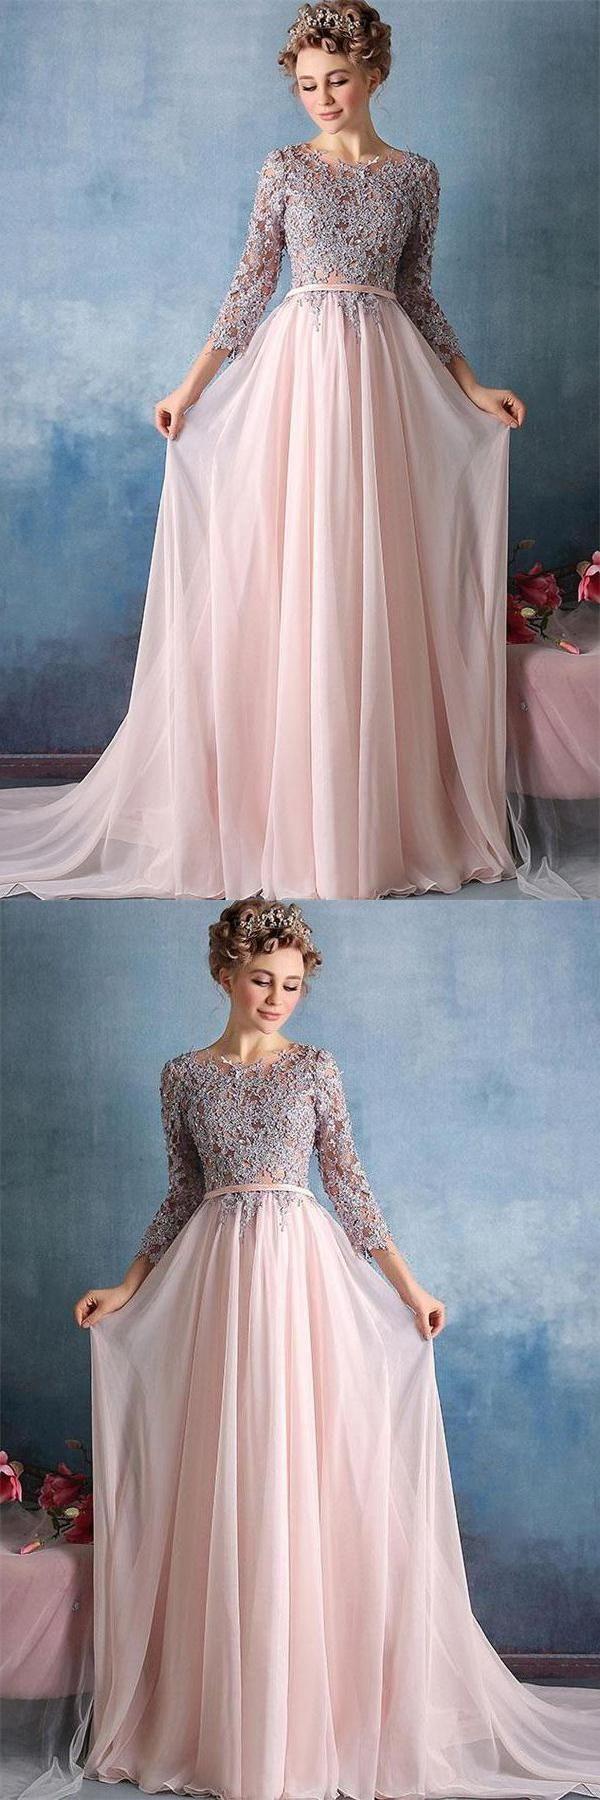 Pink prom dresses prom dresses lace prom dresses for cheap long